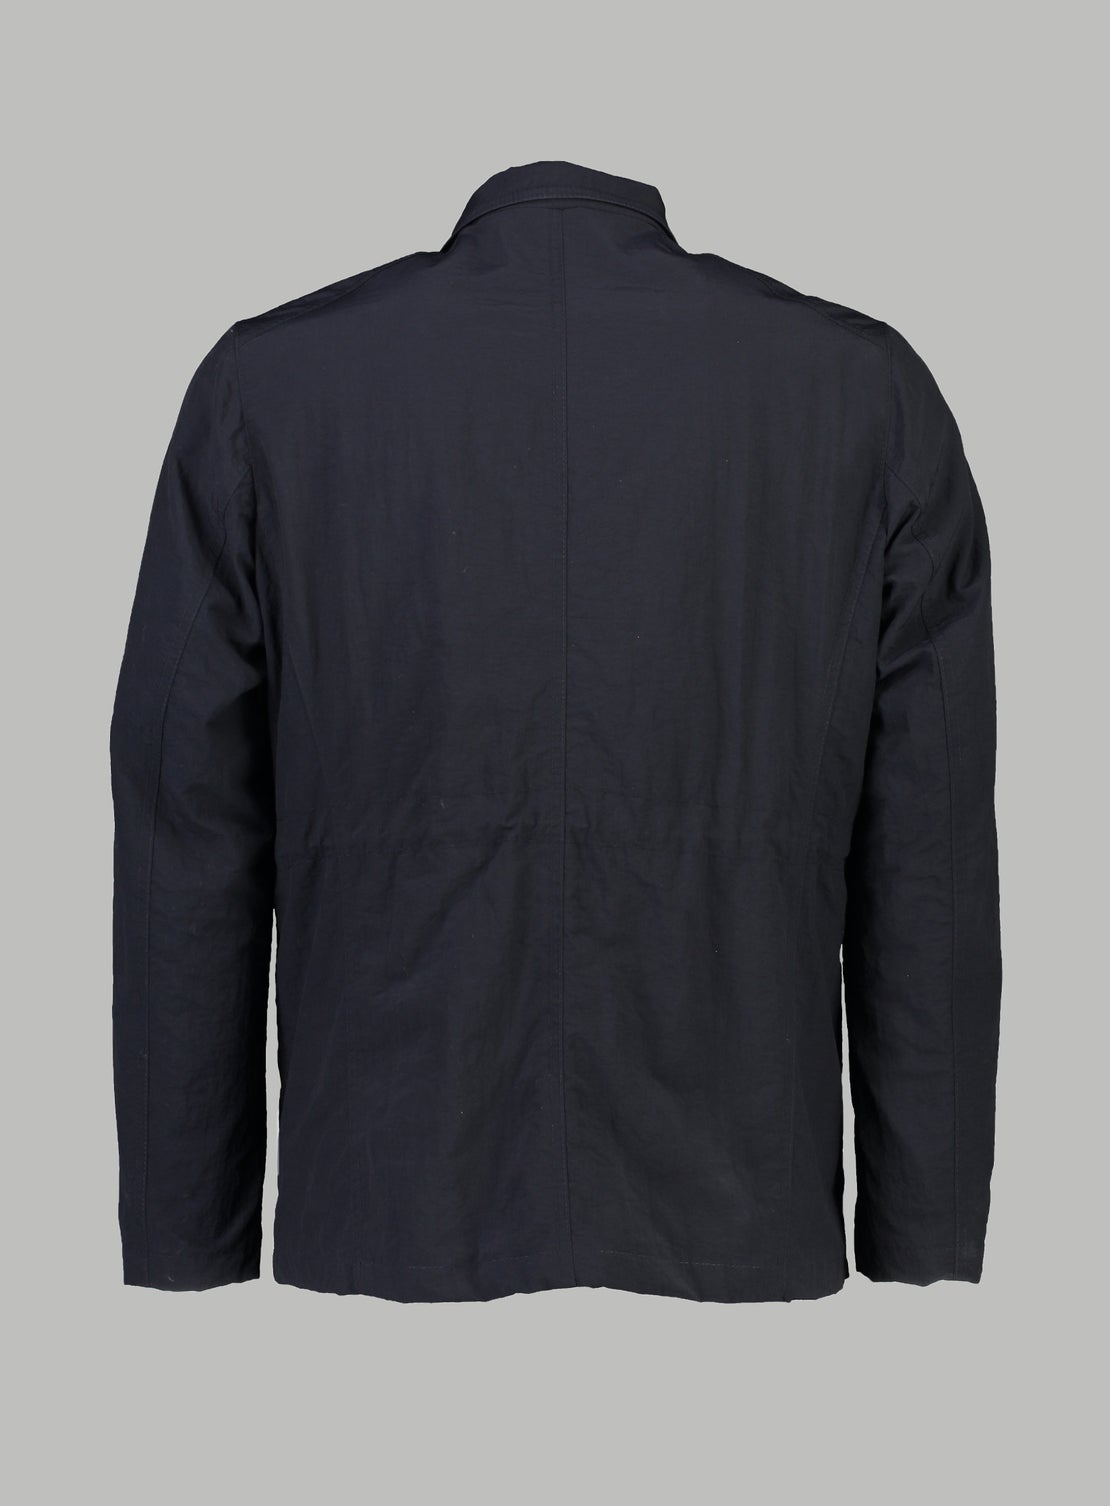 Anorak Shell Jacket